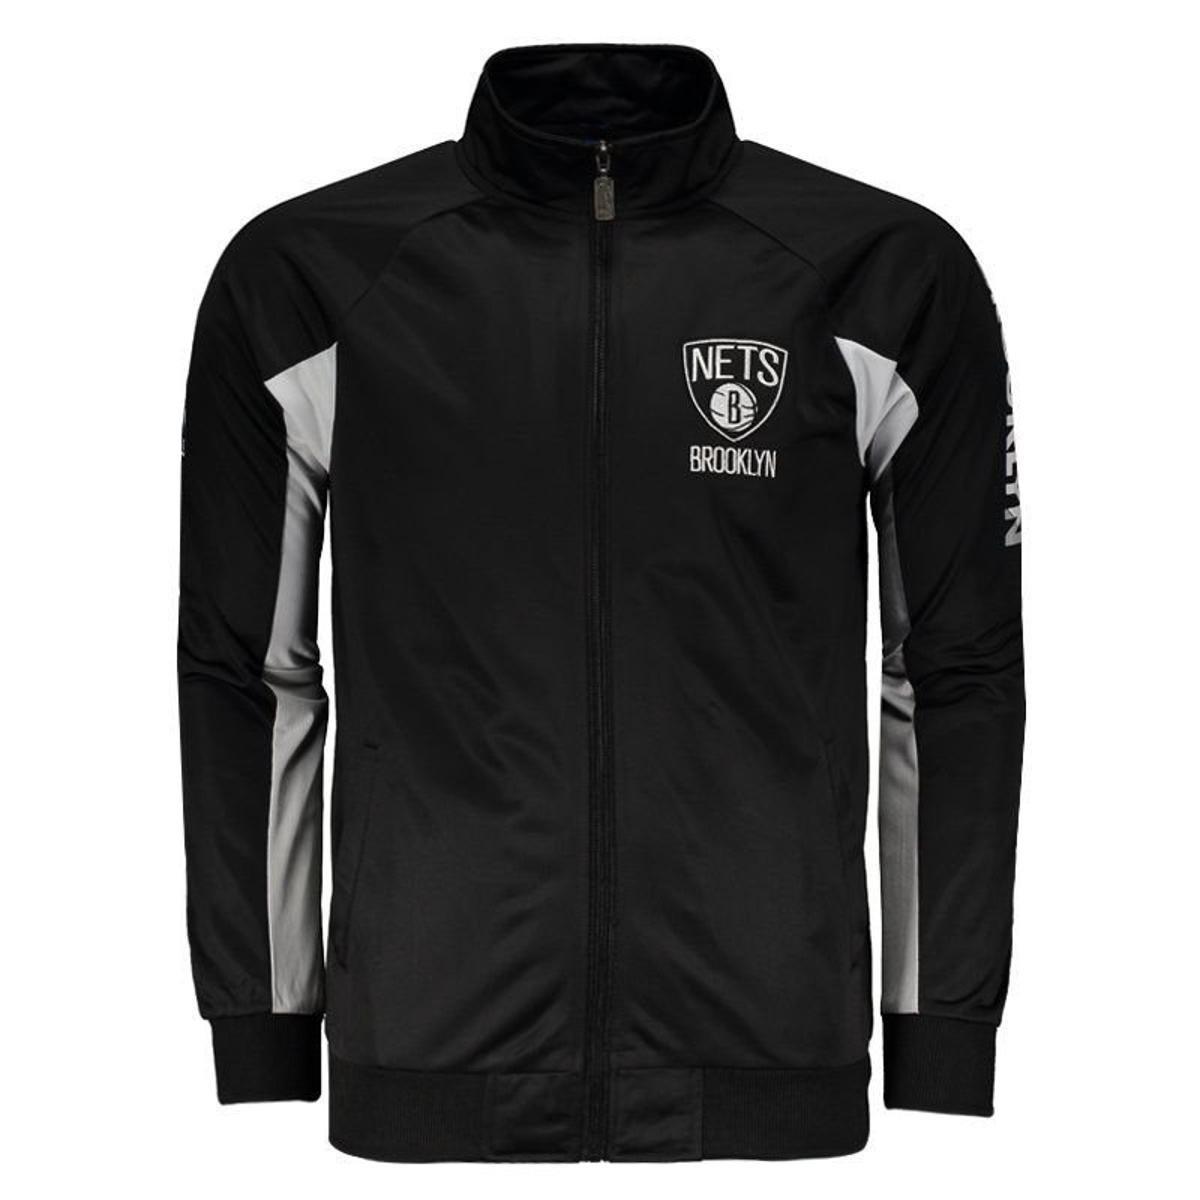 Jaqueta NBA Brooklyn Nets Masculina - Preto - Compre Agora  a3cdbf8b8ff